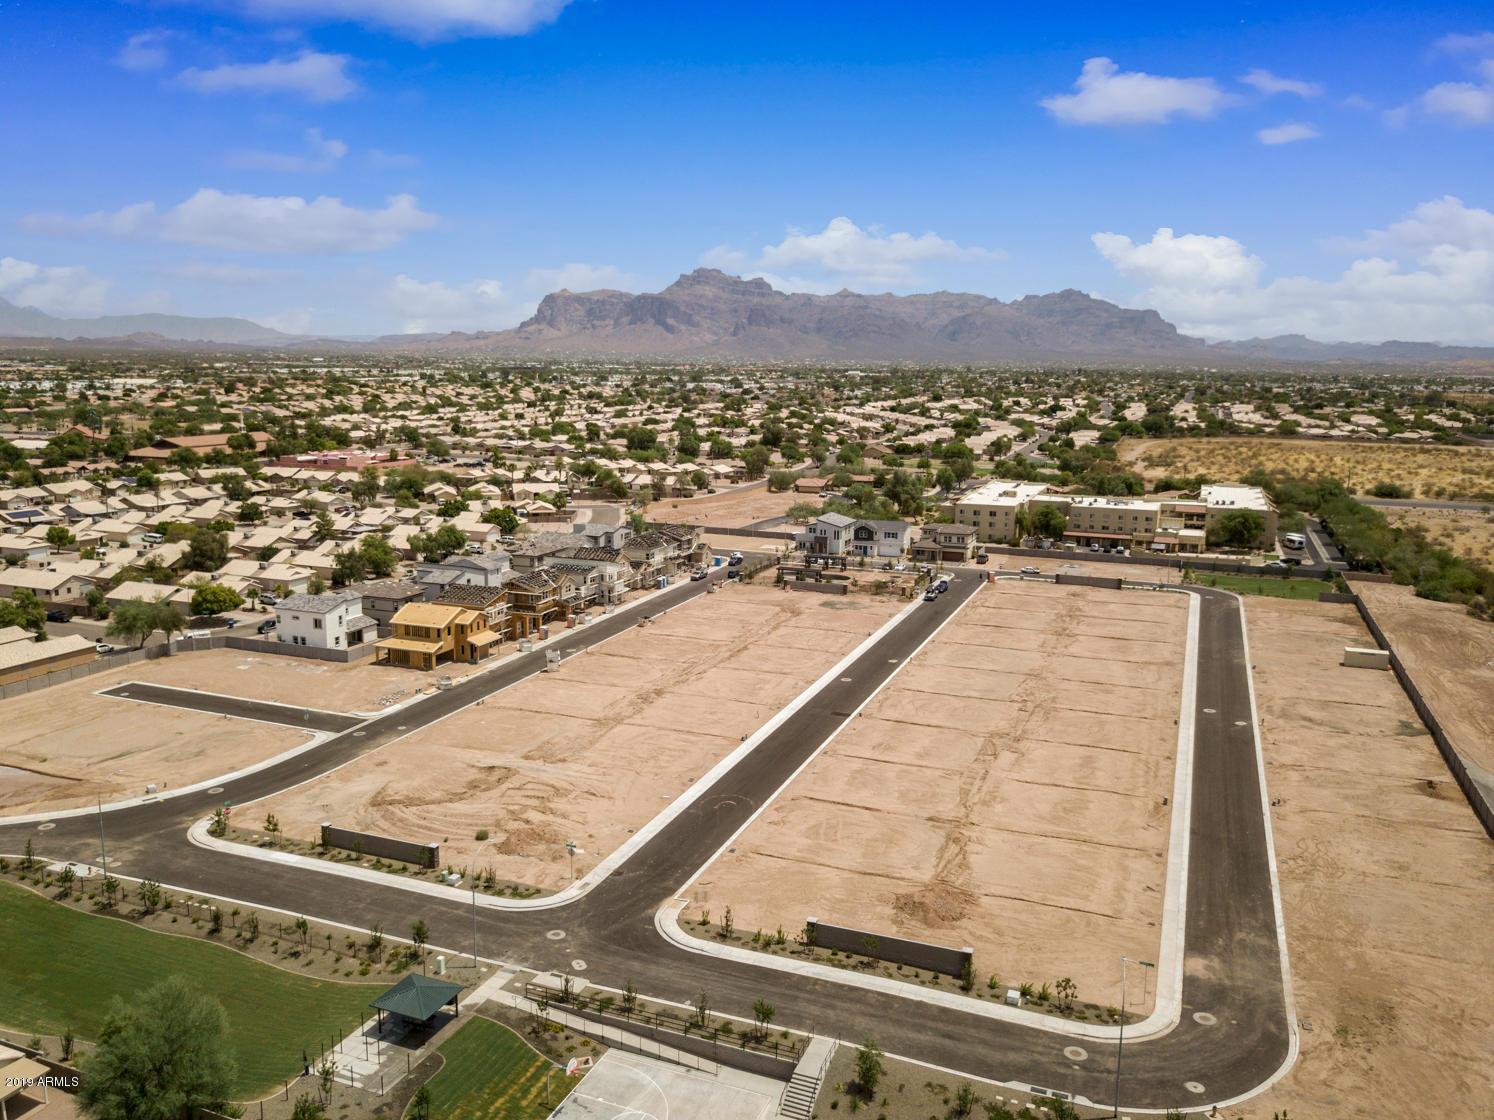 MLS 5904970 1841 W 20th Avenue, Apache Junction, AZ 85120 Apache Junction AZ Gated